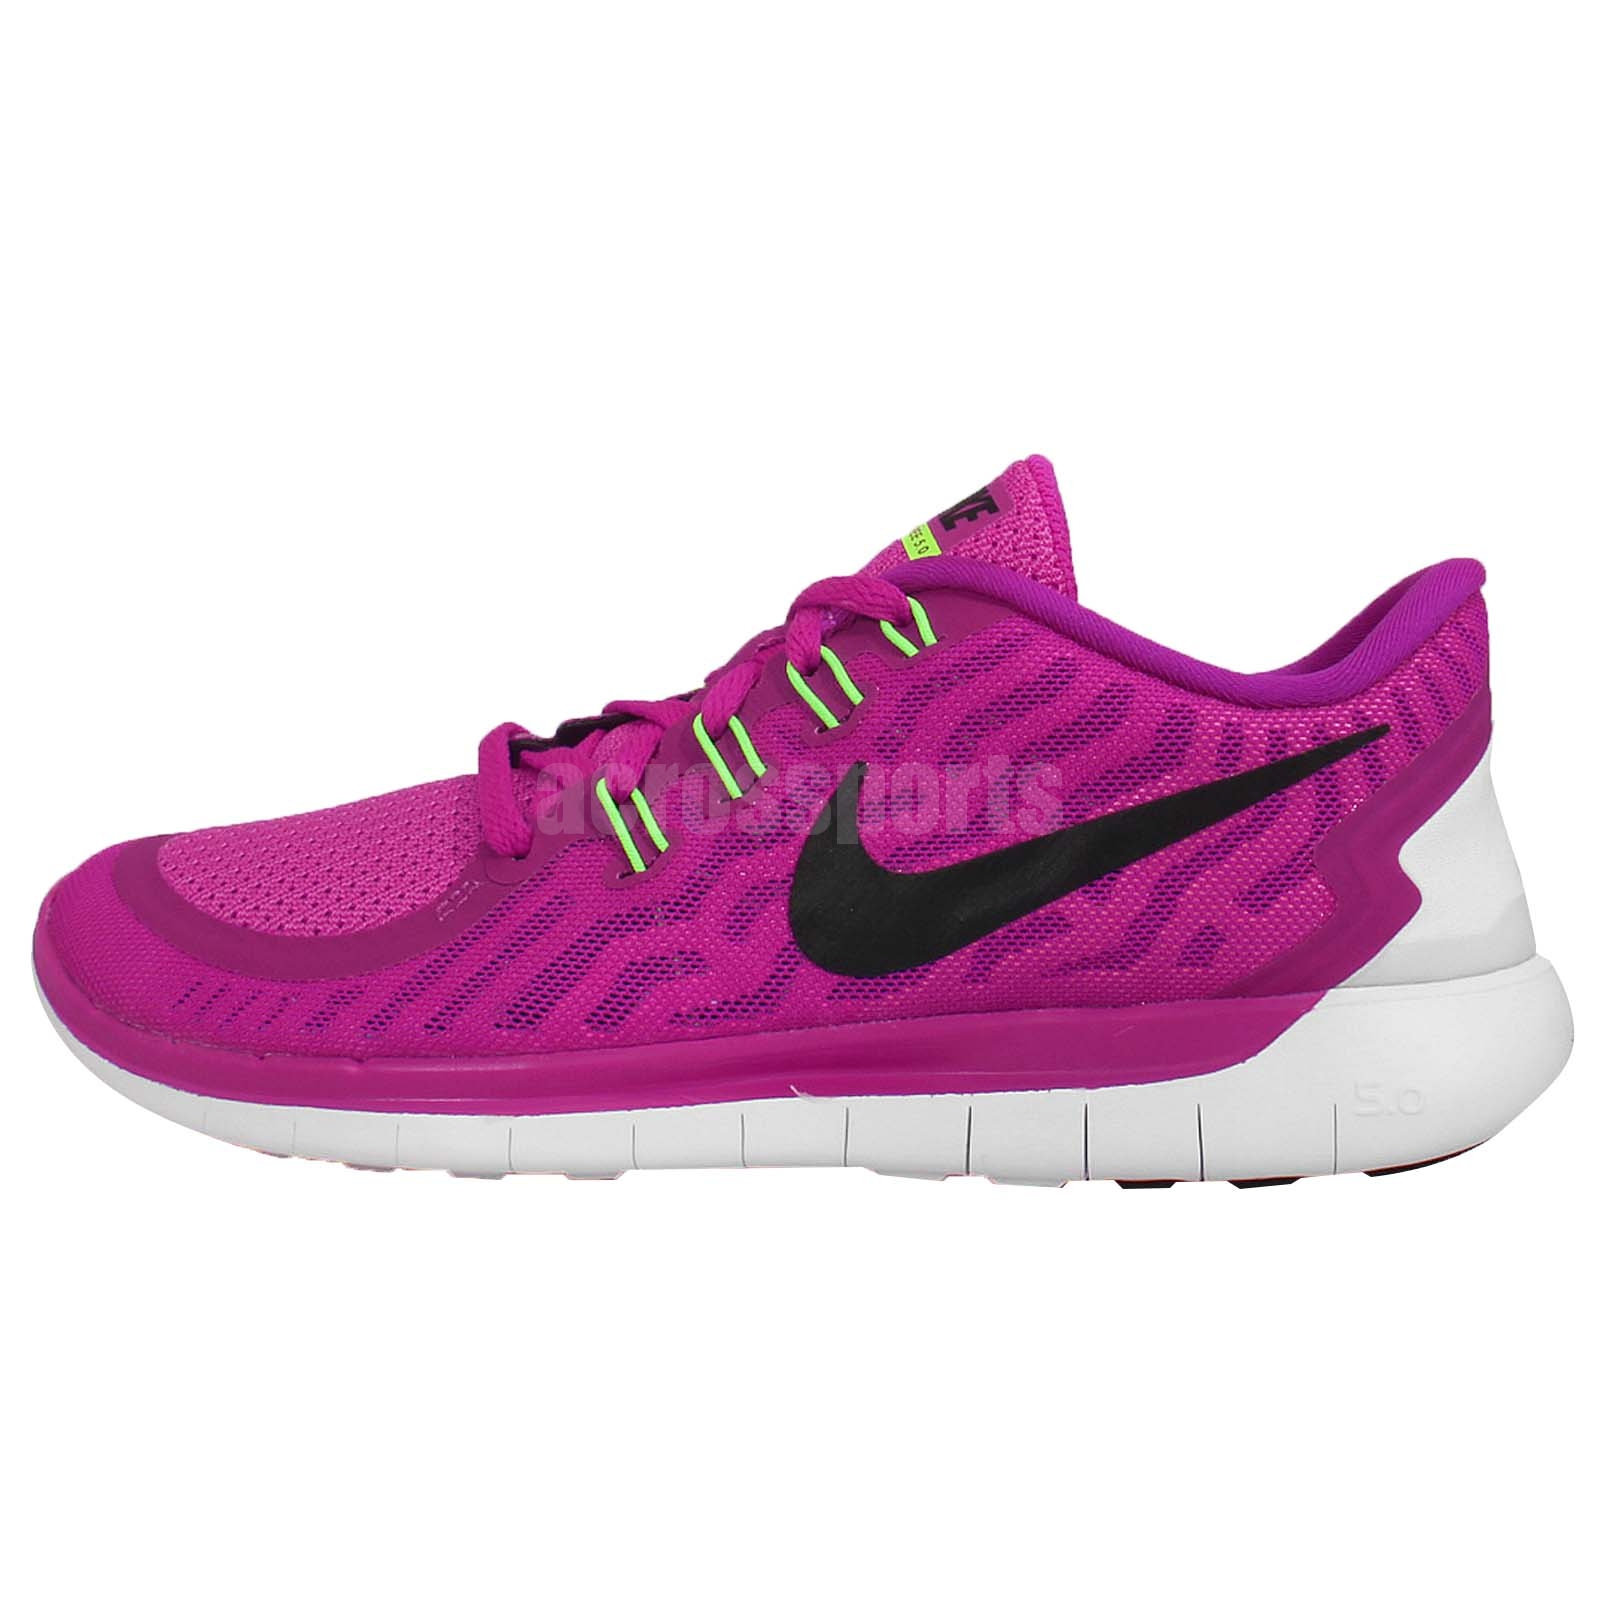 Nike Free Run Womens Ebay